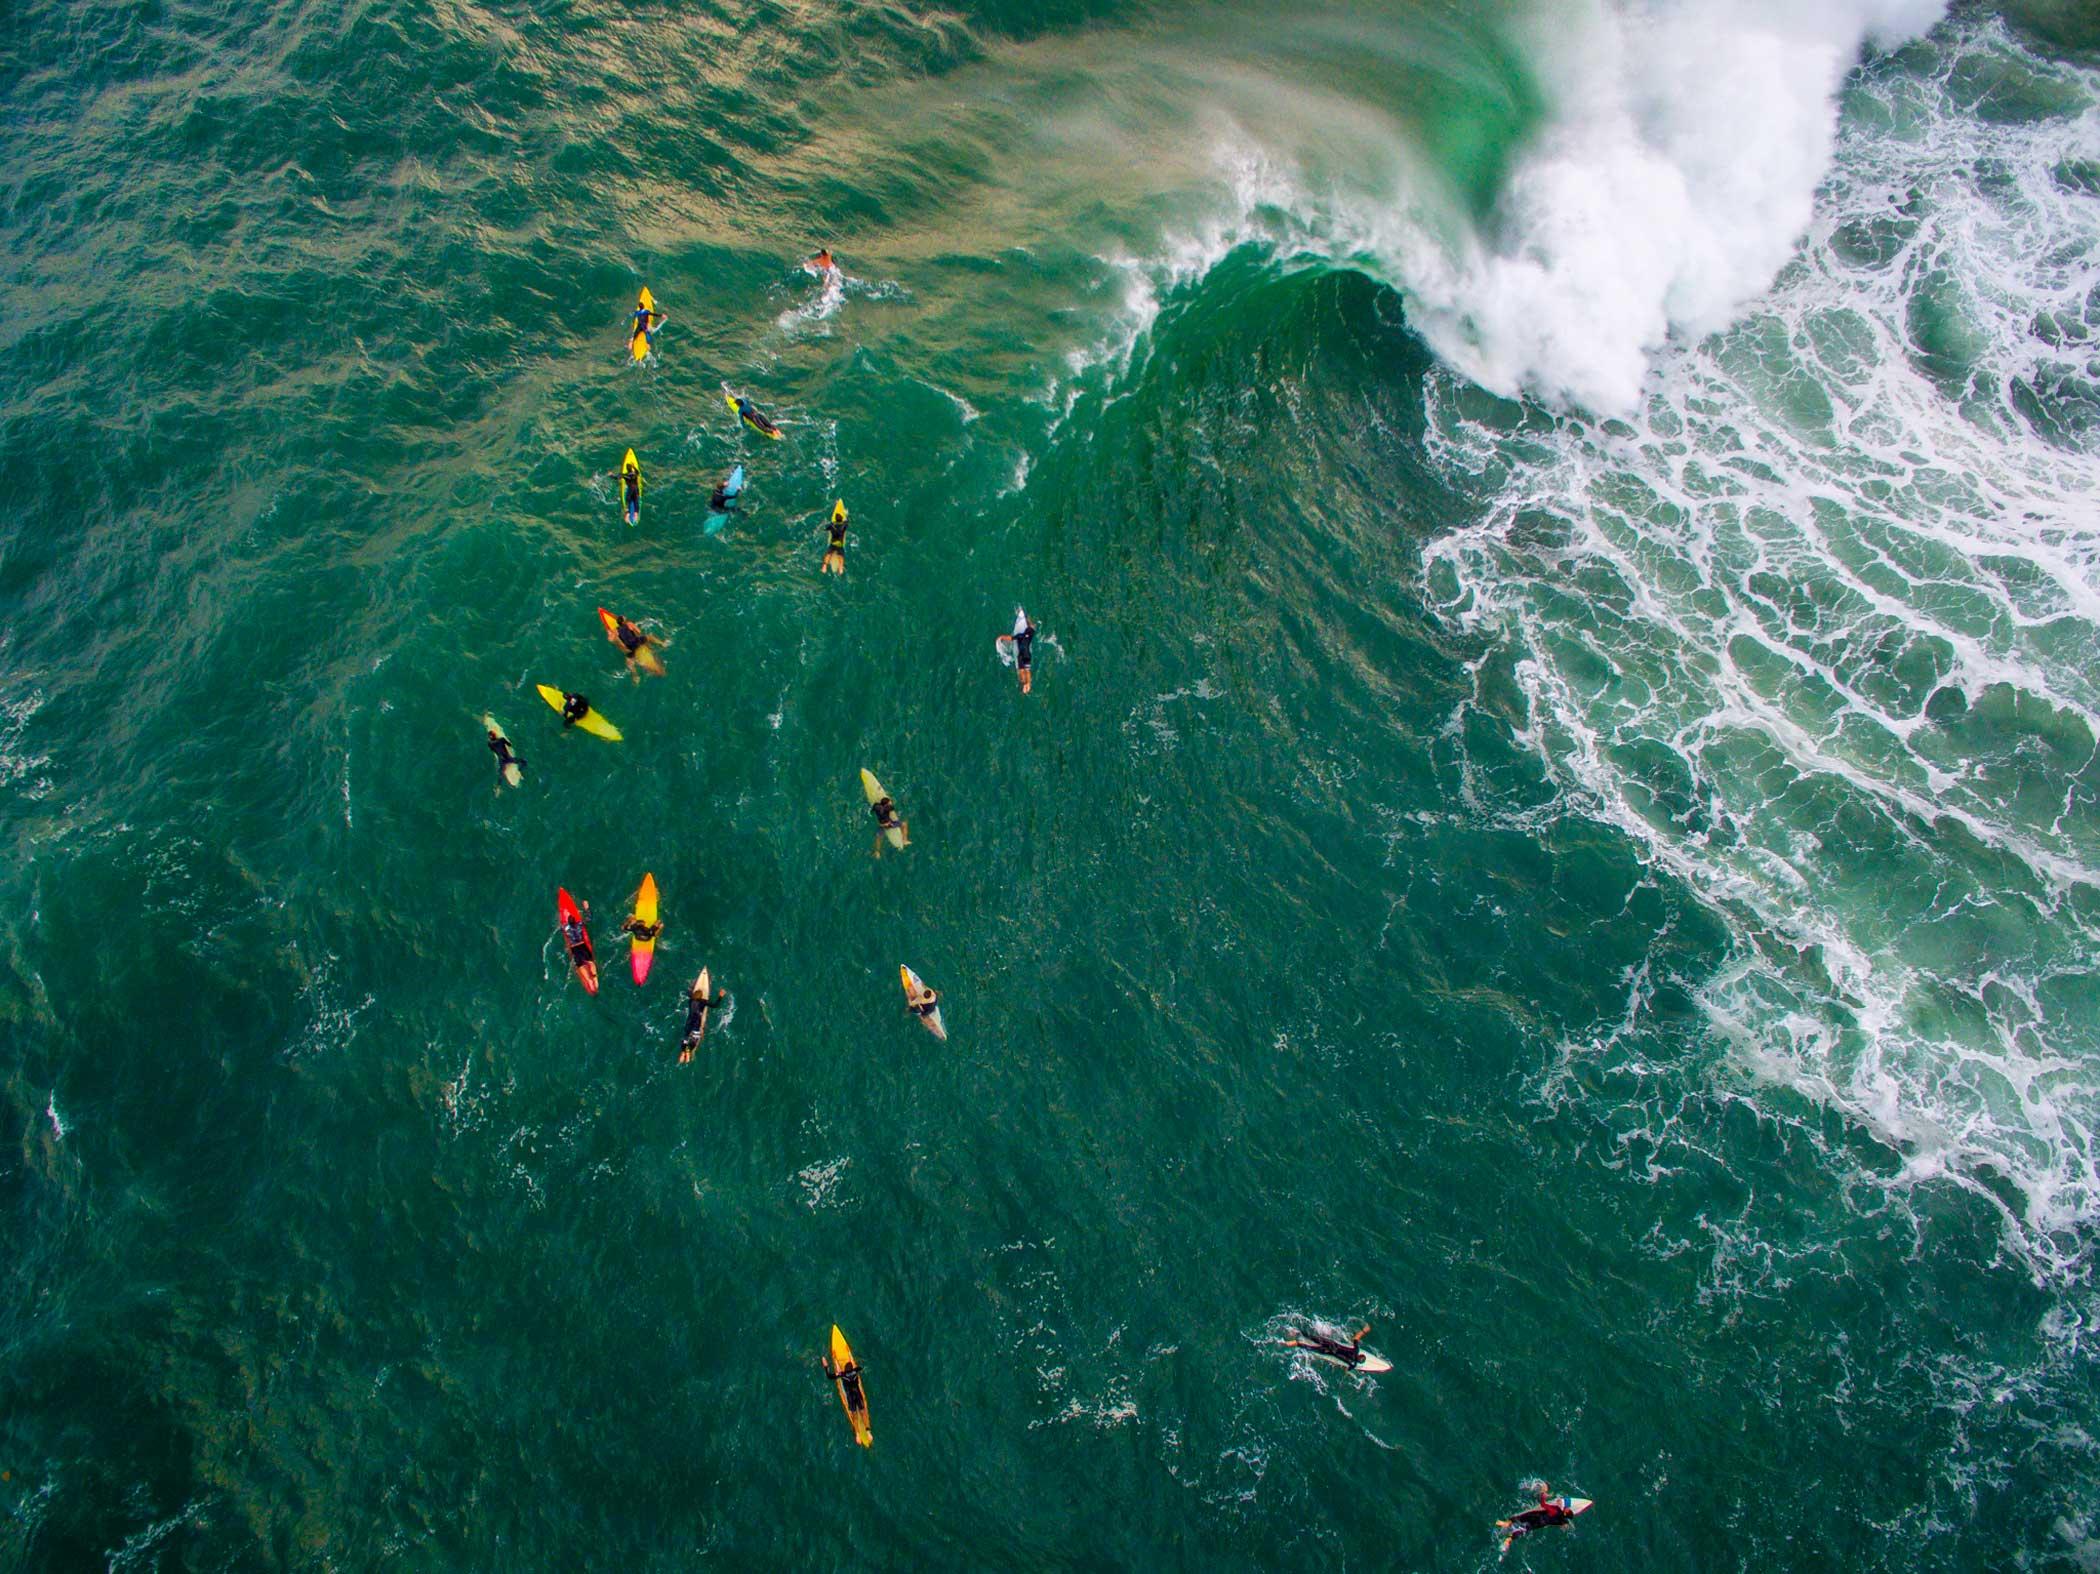 Surf session on the beach of Leblon in Rio de Janeiro.